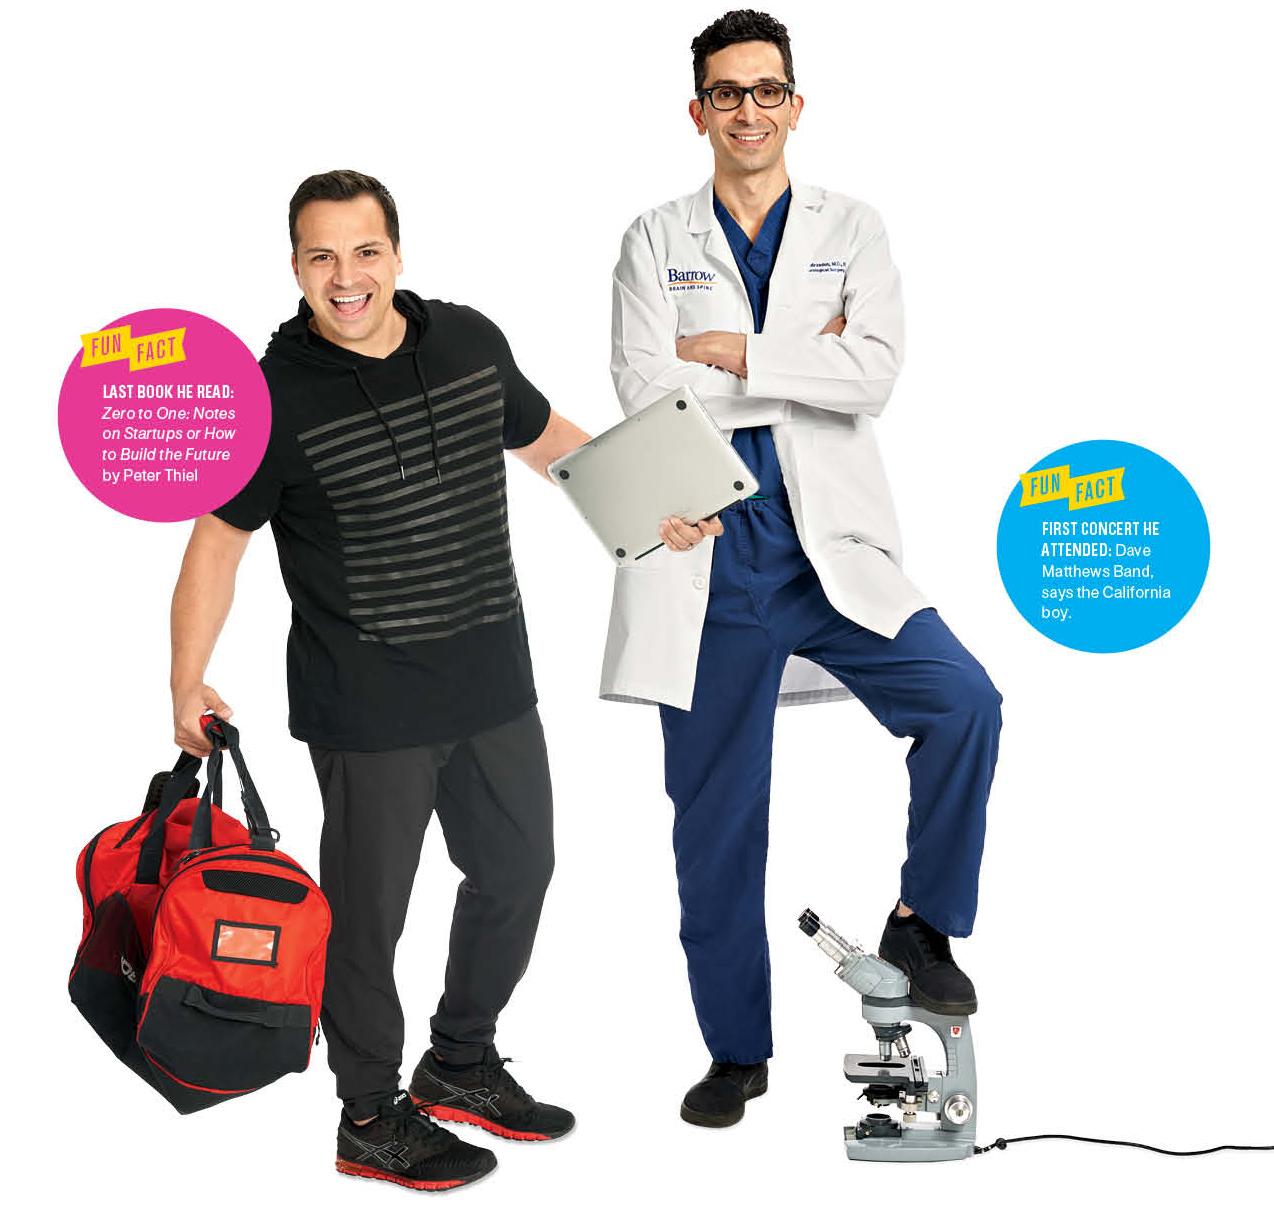 The Health Czars: Michael Jodscheidt(left), Zaman Mirzadeh(right)